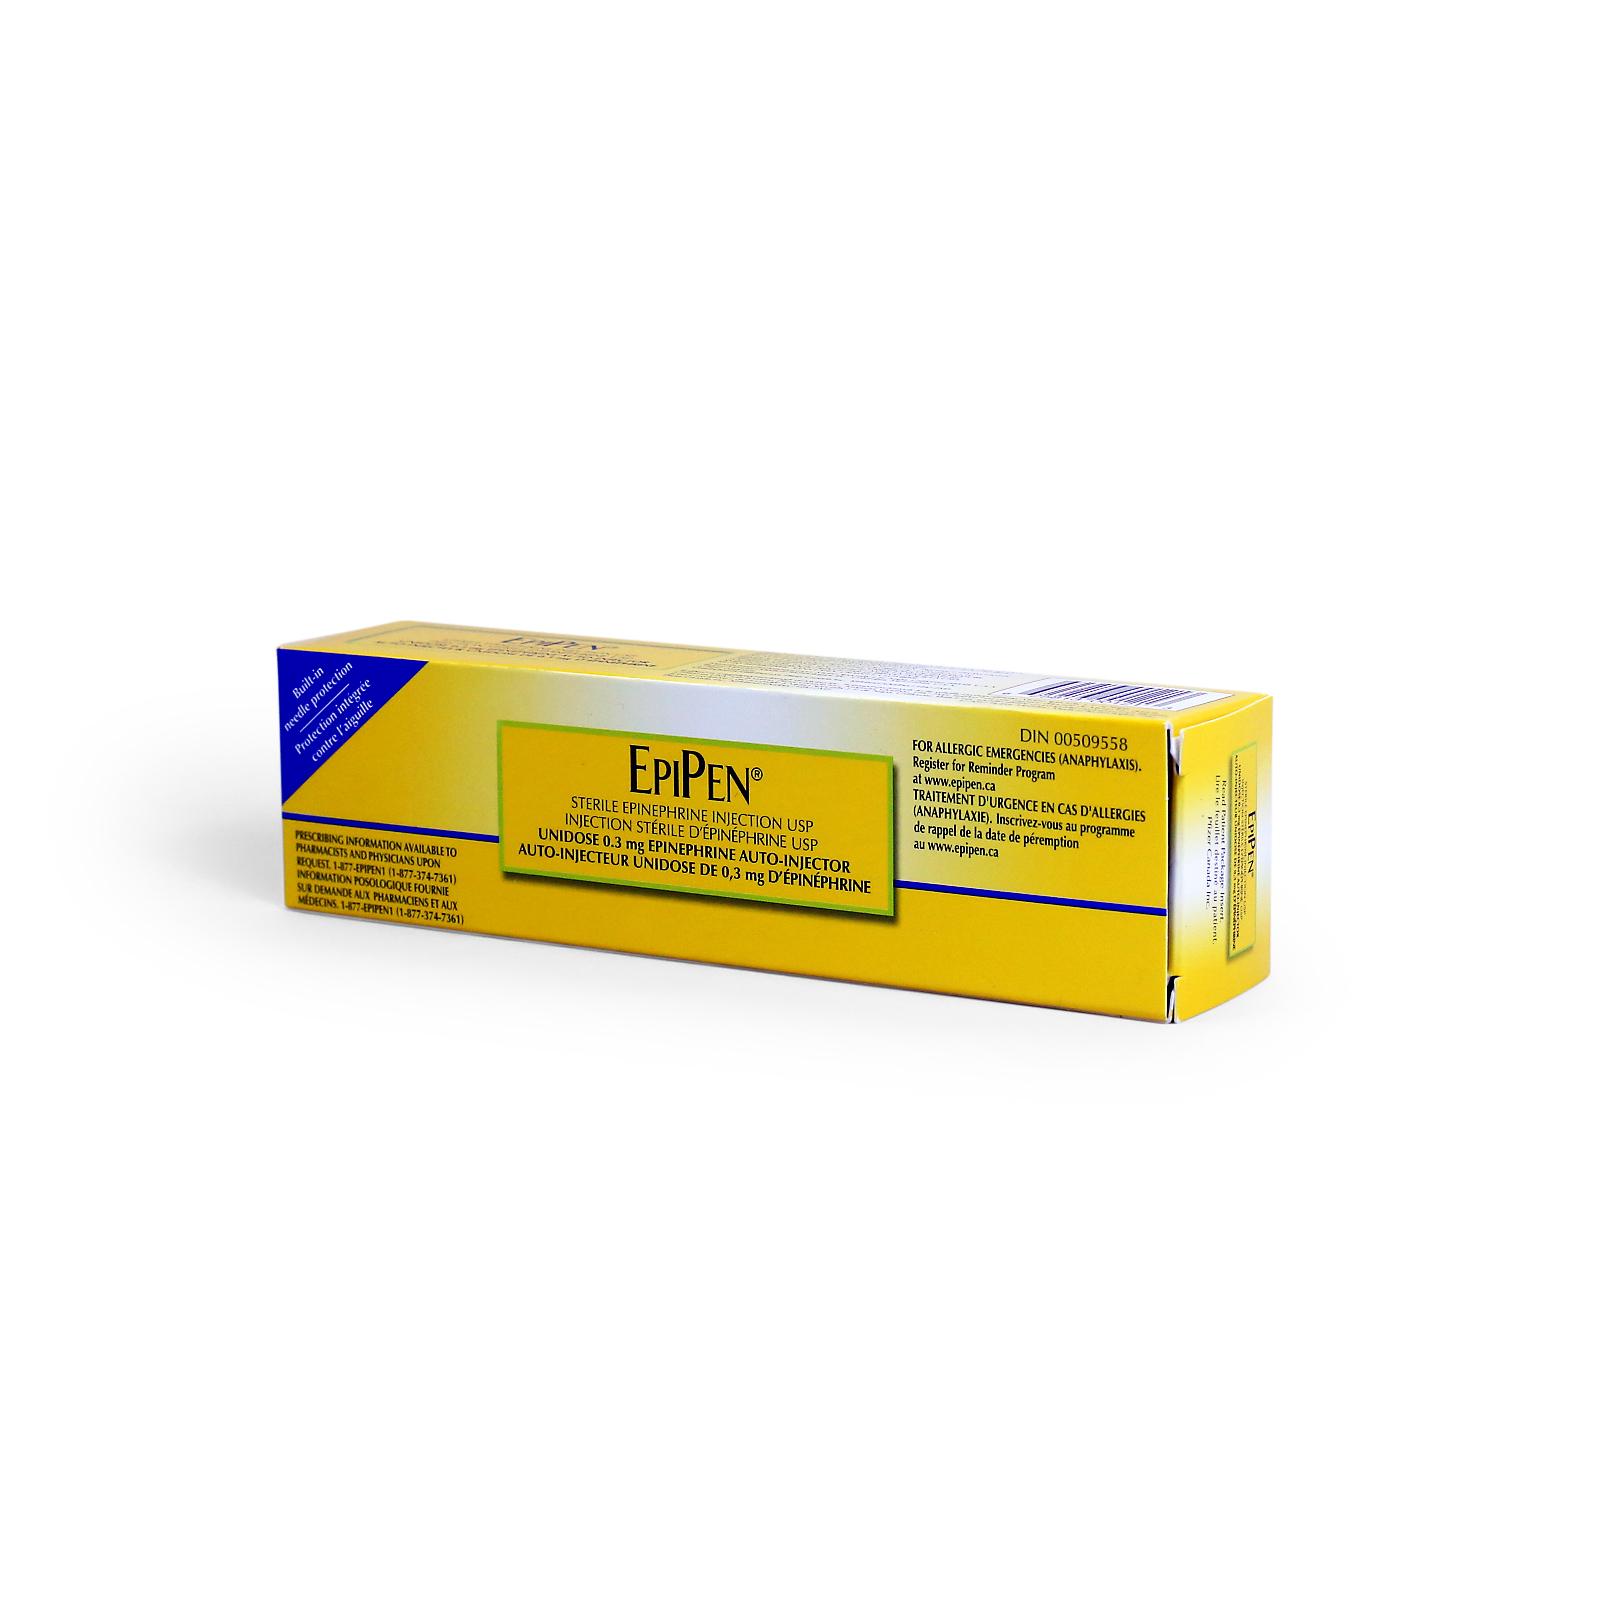 Picture of Pfizer EpiPen® Epi Inj Unidose 0.3 mg auto-inj (Adult), 1 Inj/Bx